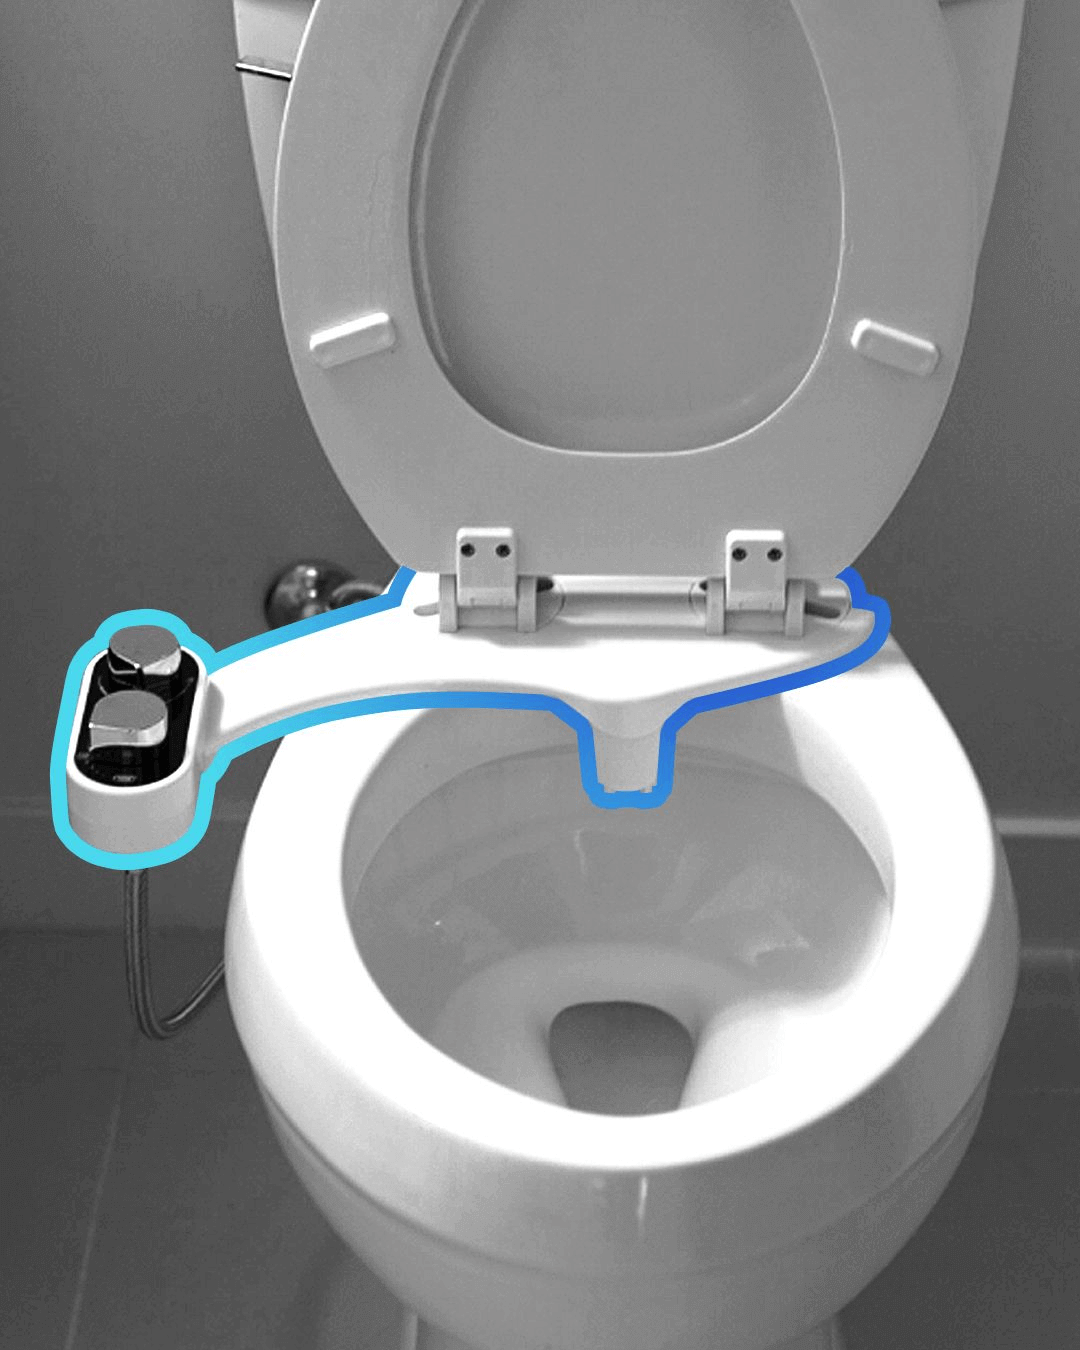 Clear Rear In 2020 Buy Toilet Toilet Accessories Nautical Bathroom Decor